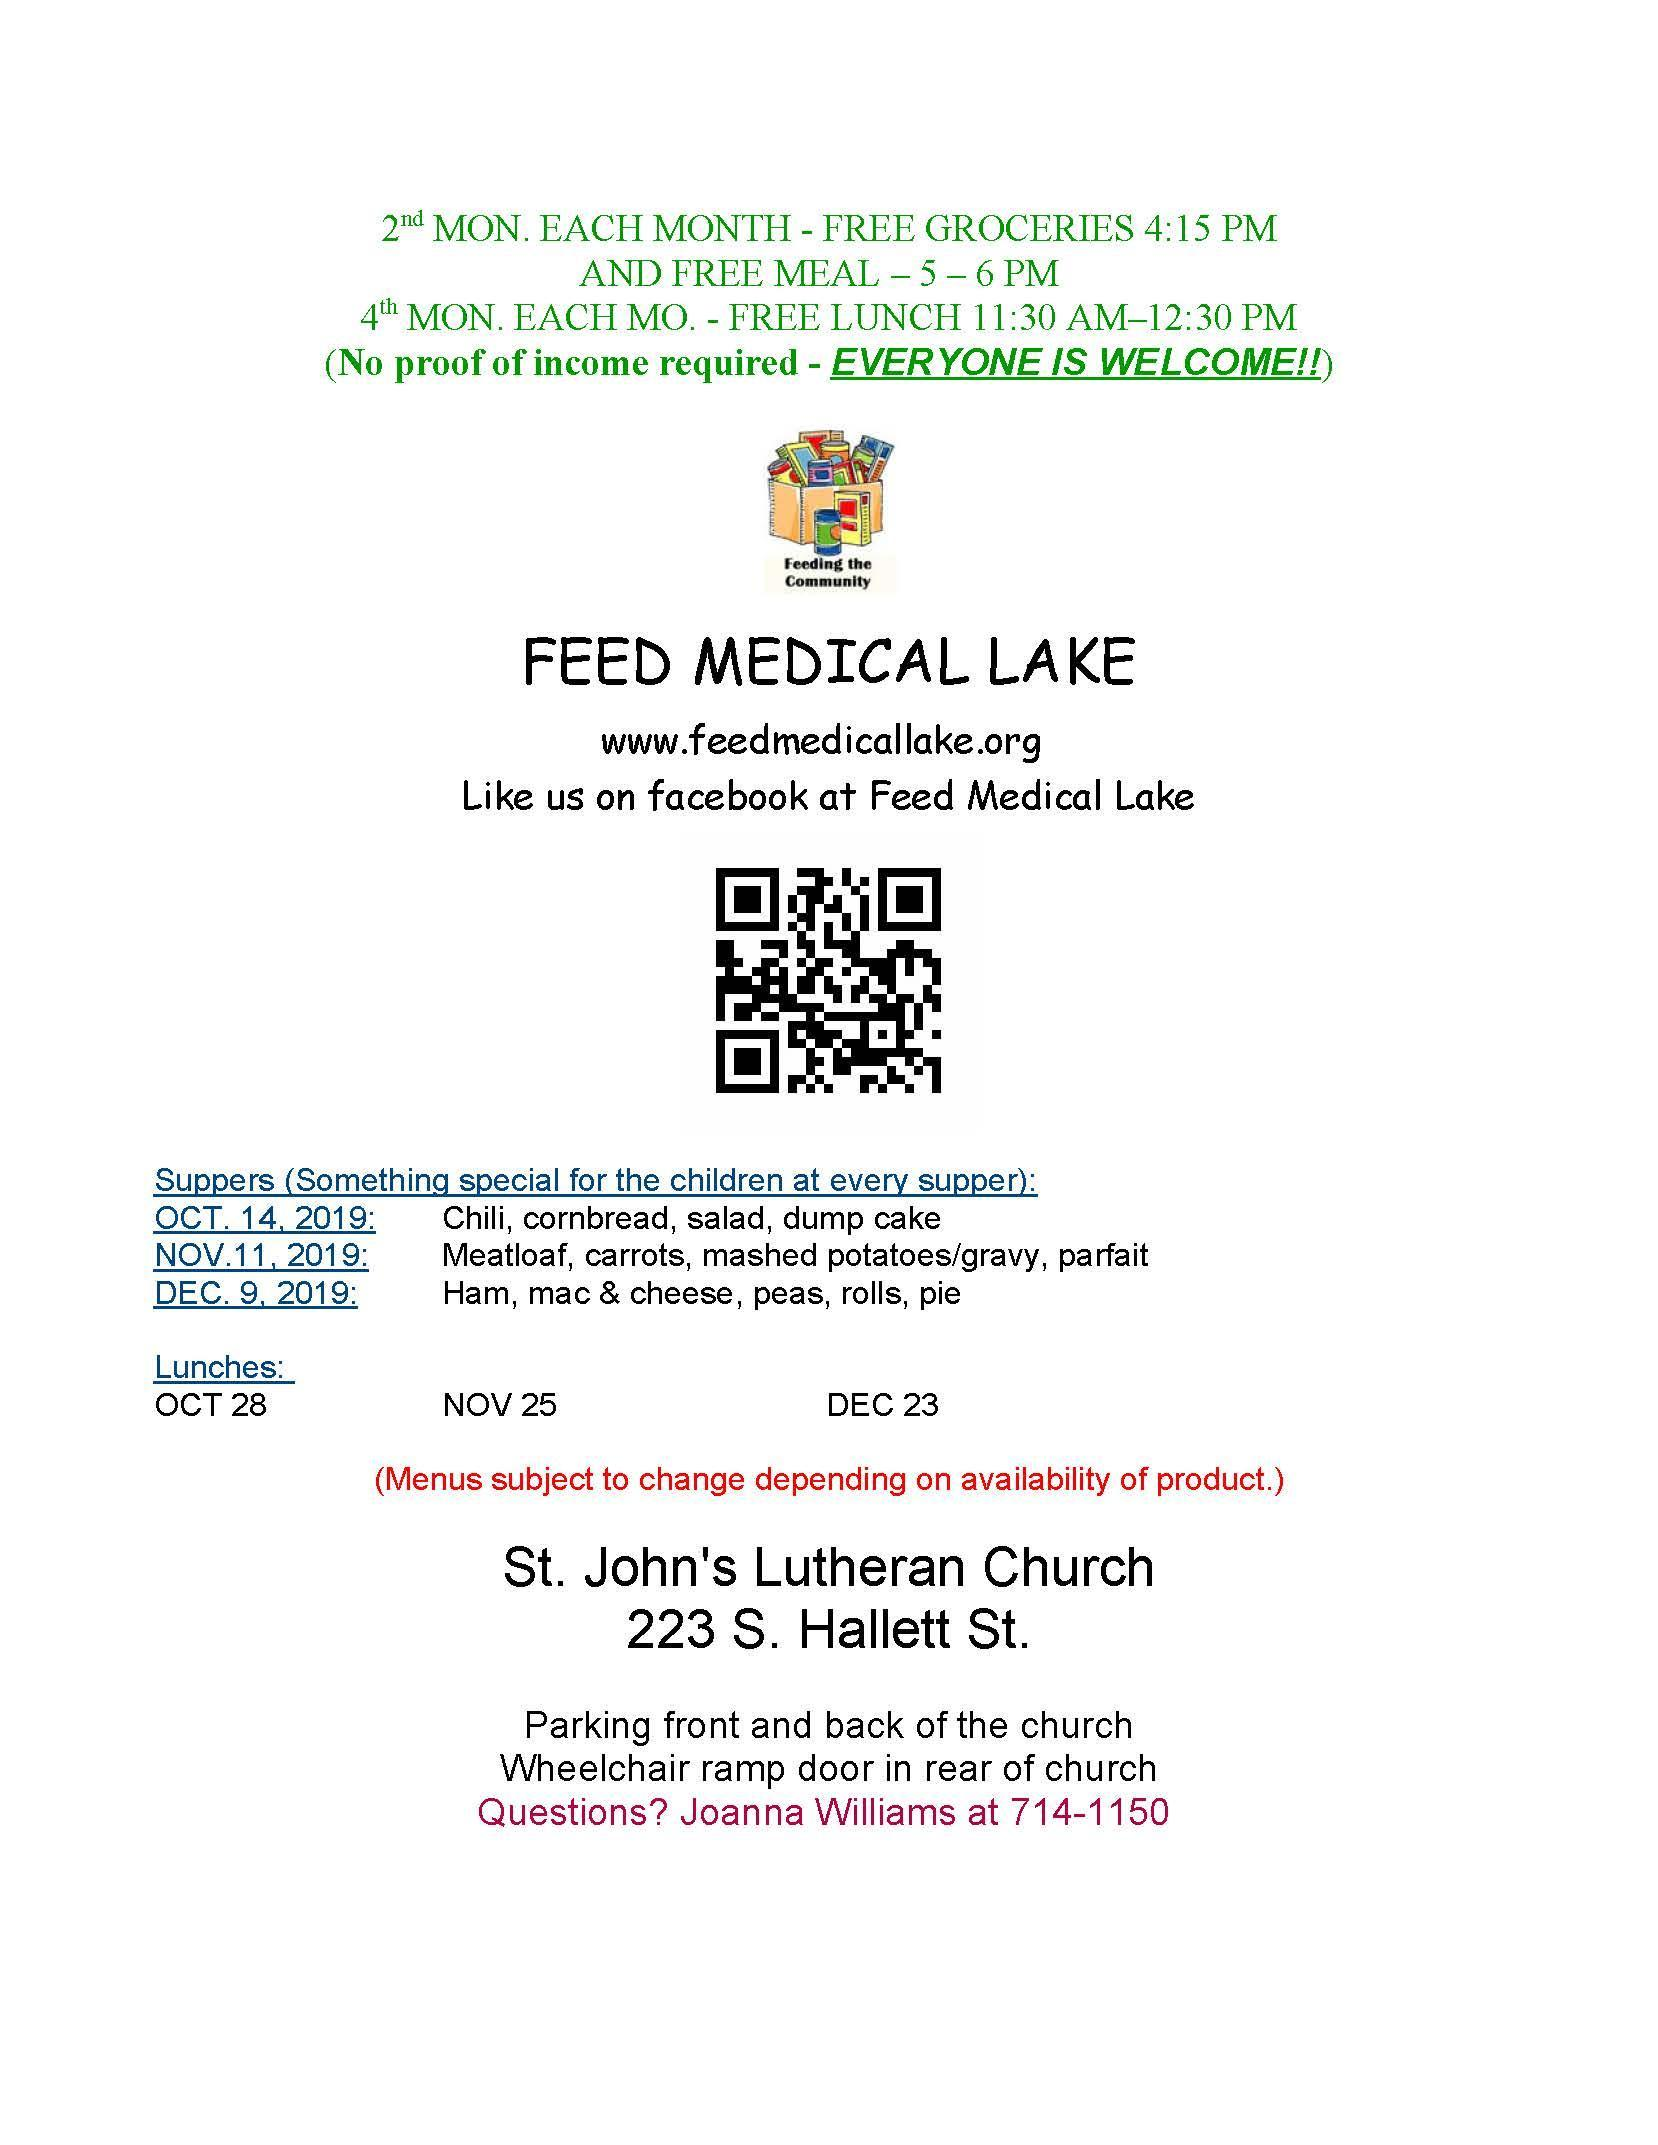 Feed Medical Lake October, November, December